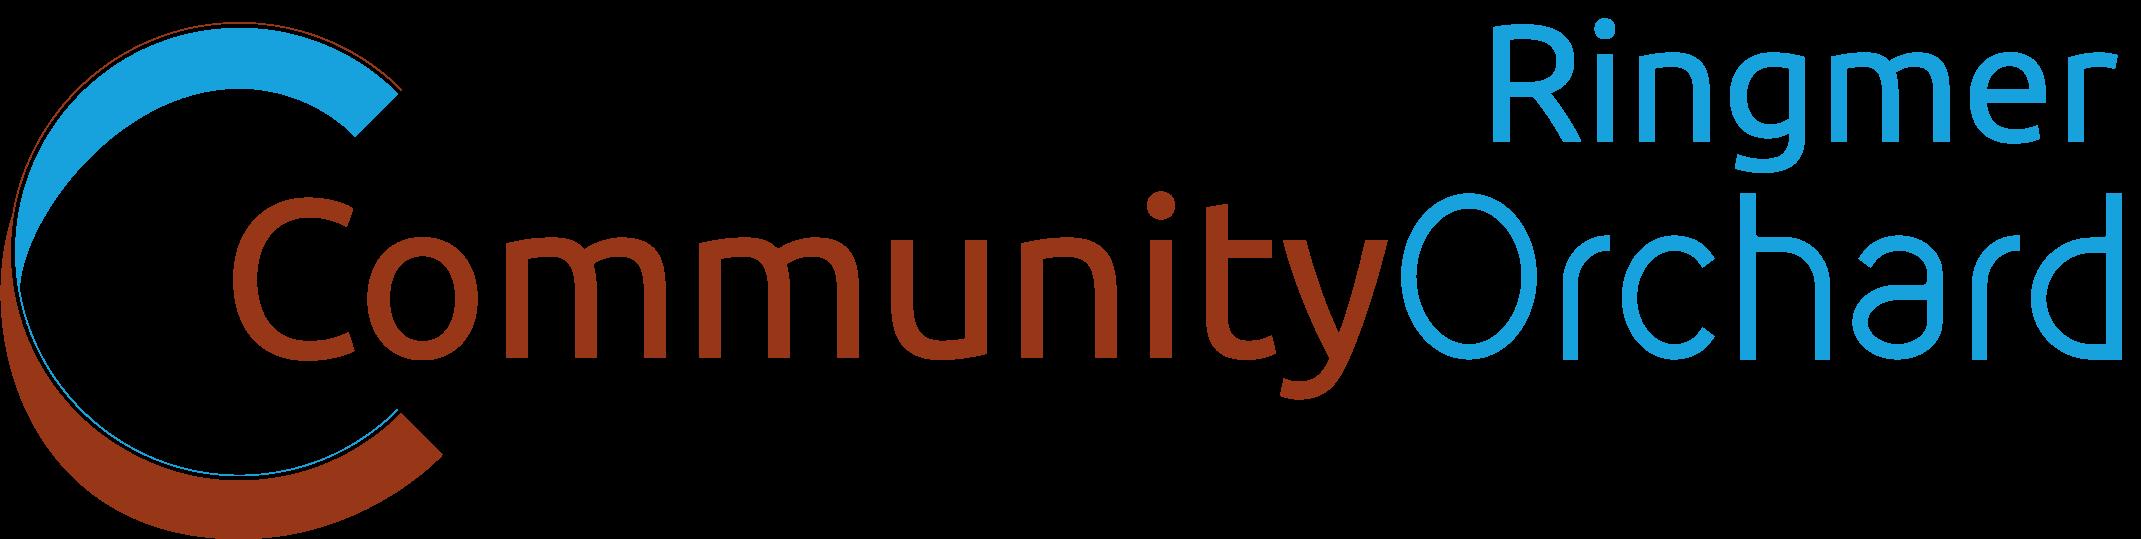 logo for Ringmer Community Orchard